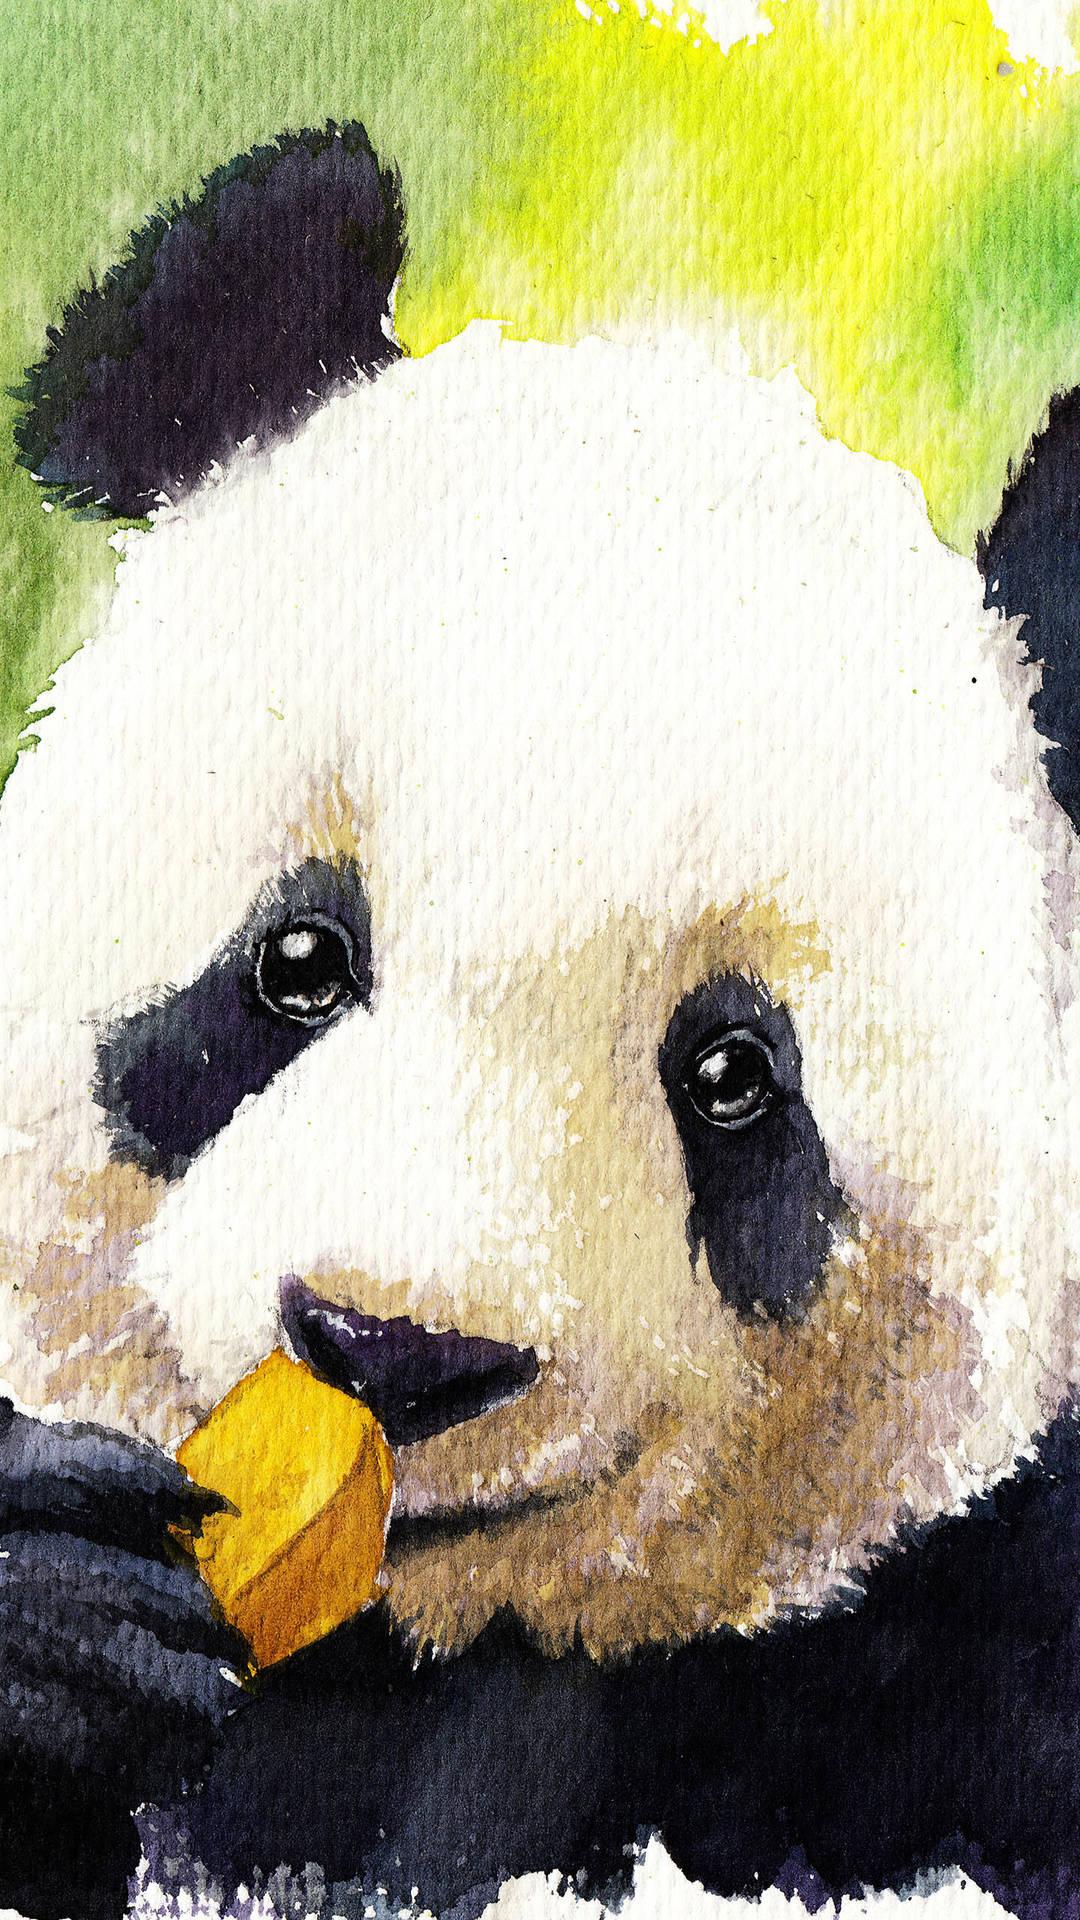 Banana Wallpaper Iphone 6 11 Cute Panda Wallpapers For Iphone With 1920x1080